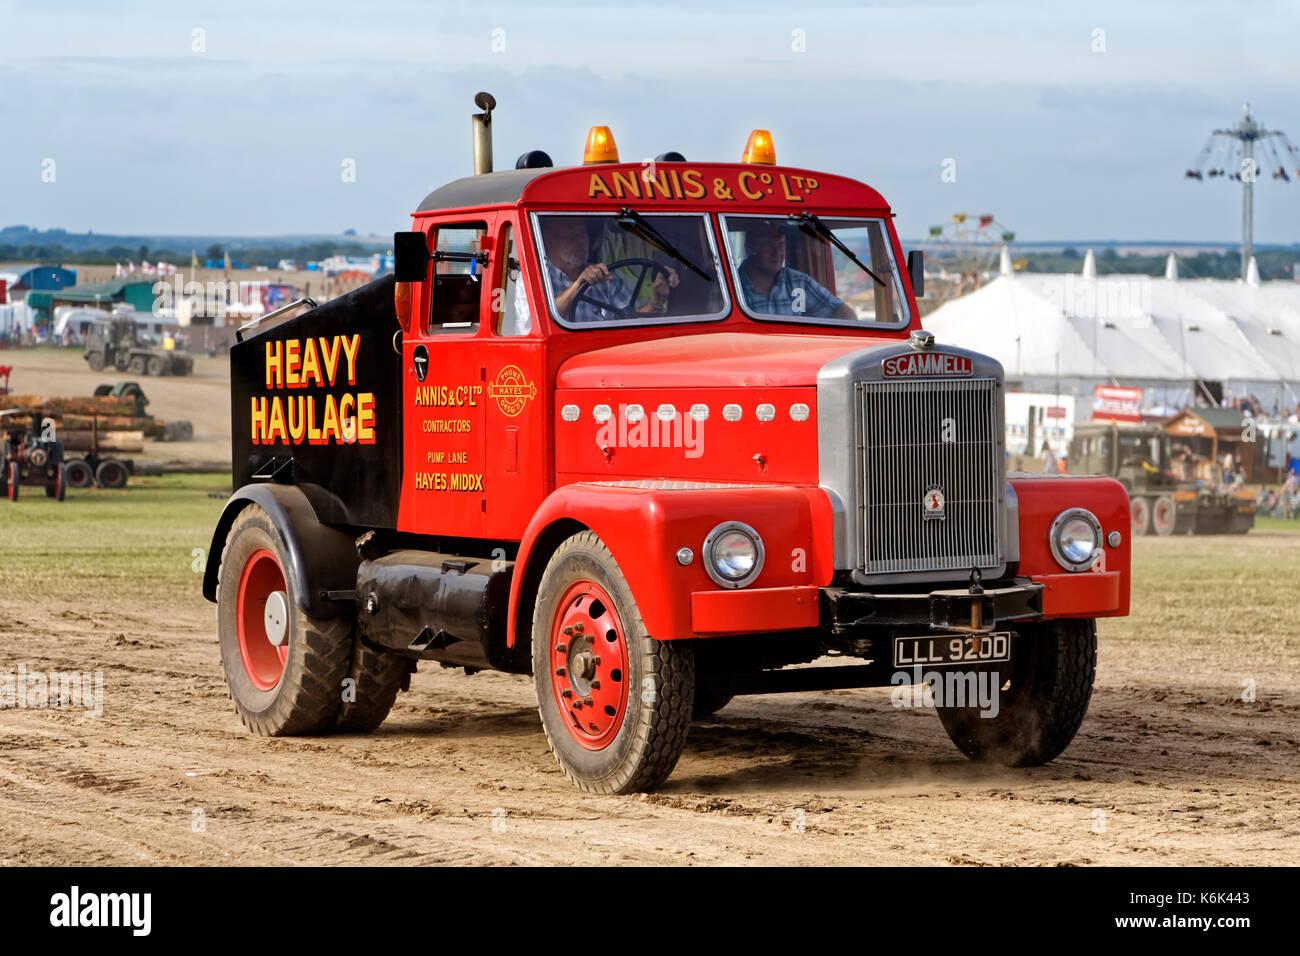 Vintage Heavy Haulage Lorry Stock Photos & Vintage Heavy Haulage ...